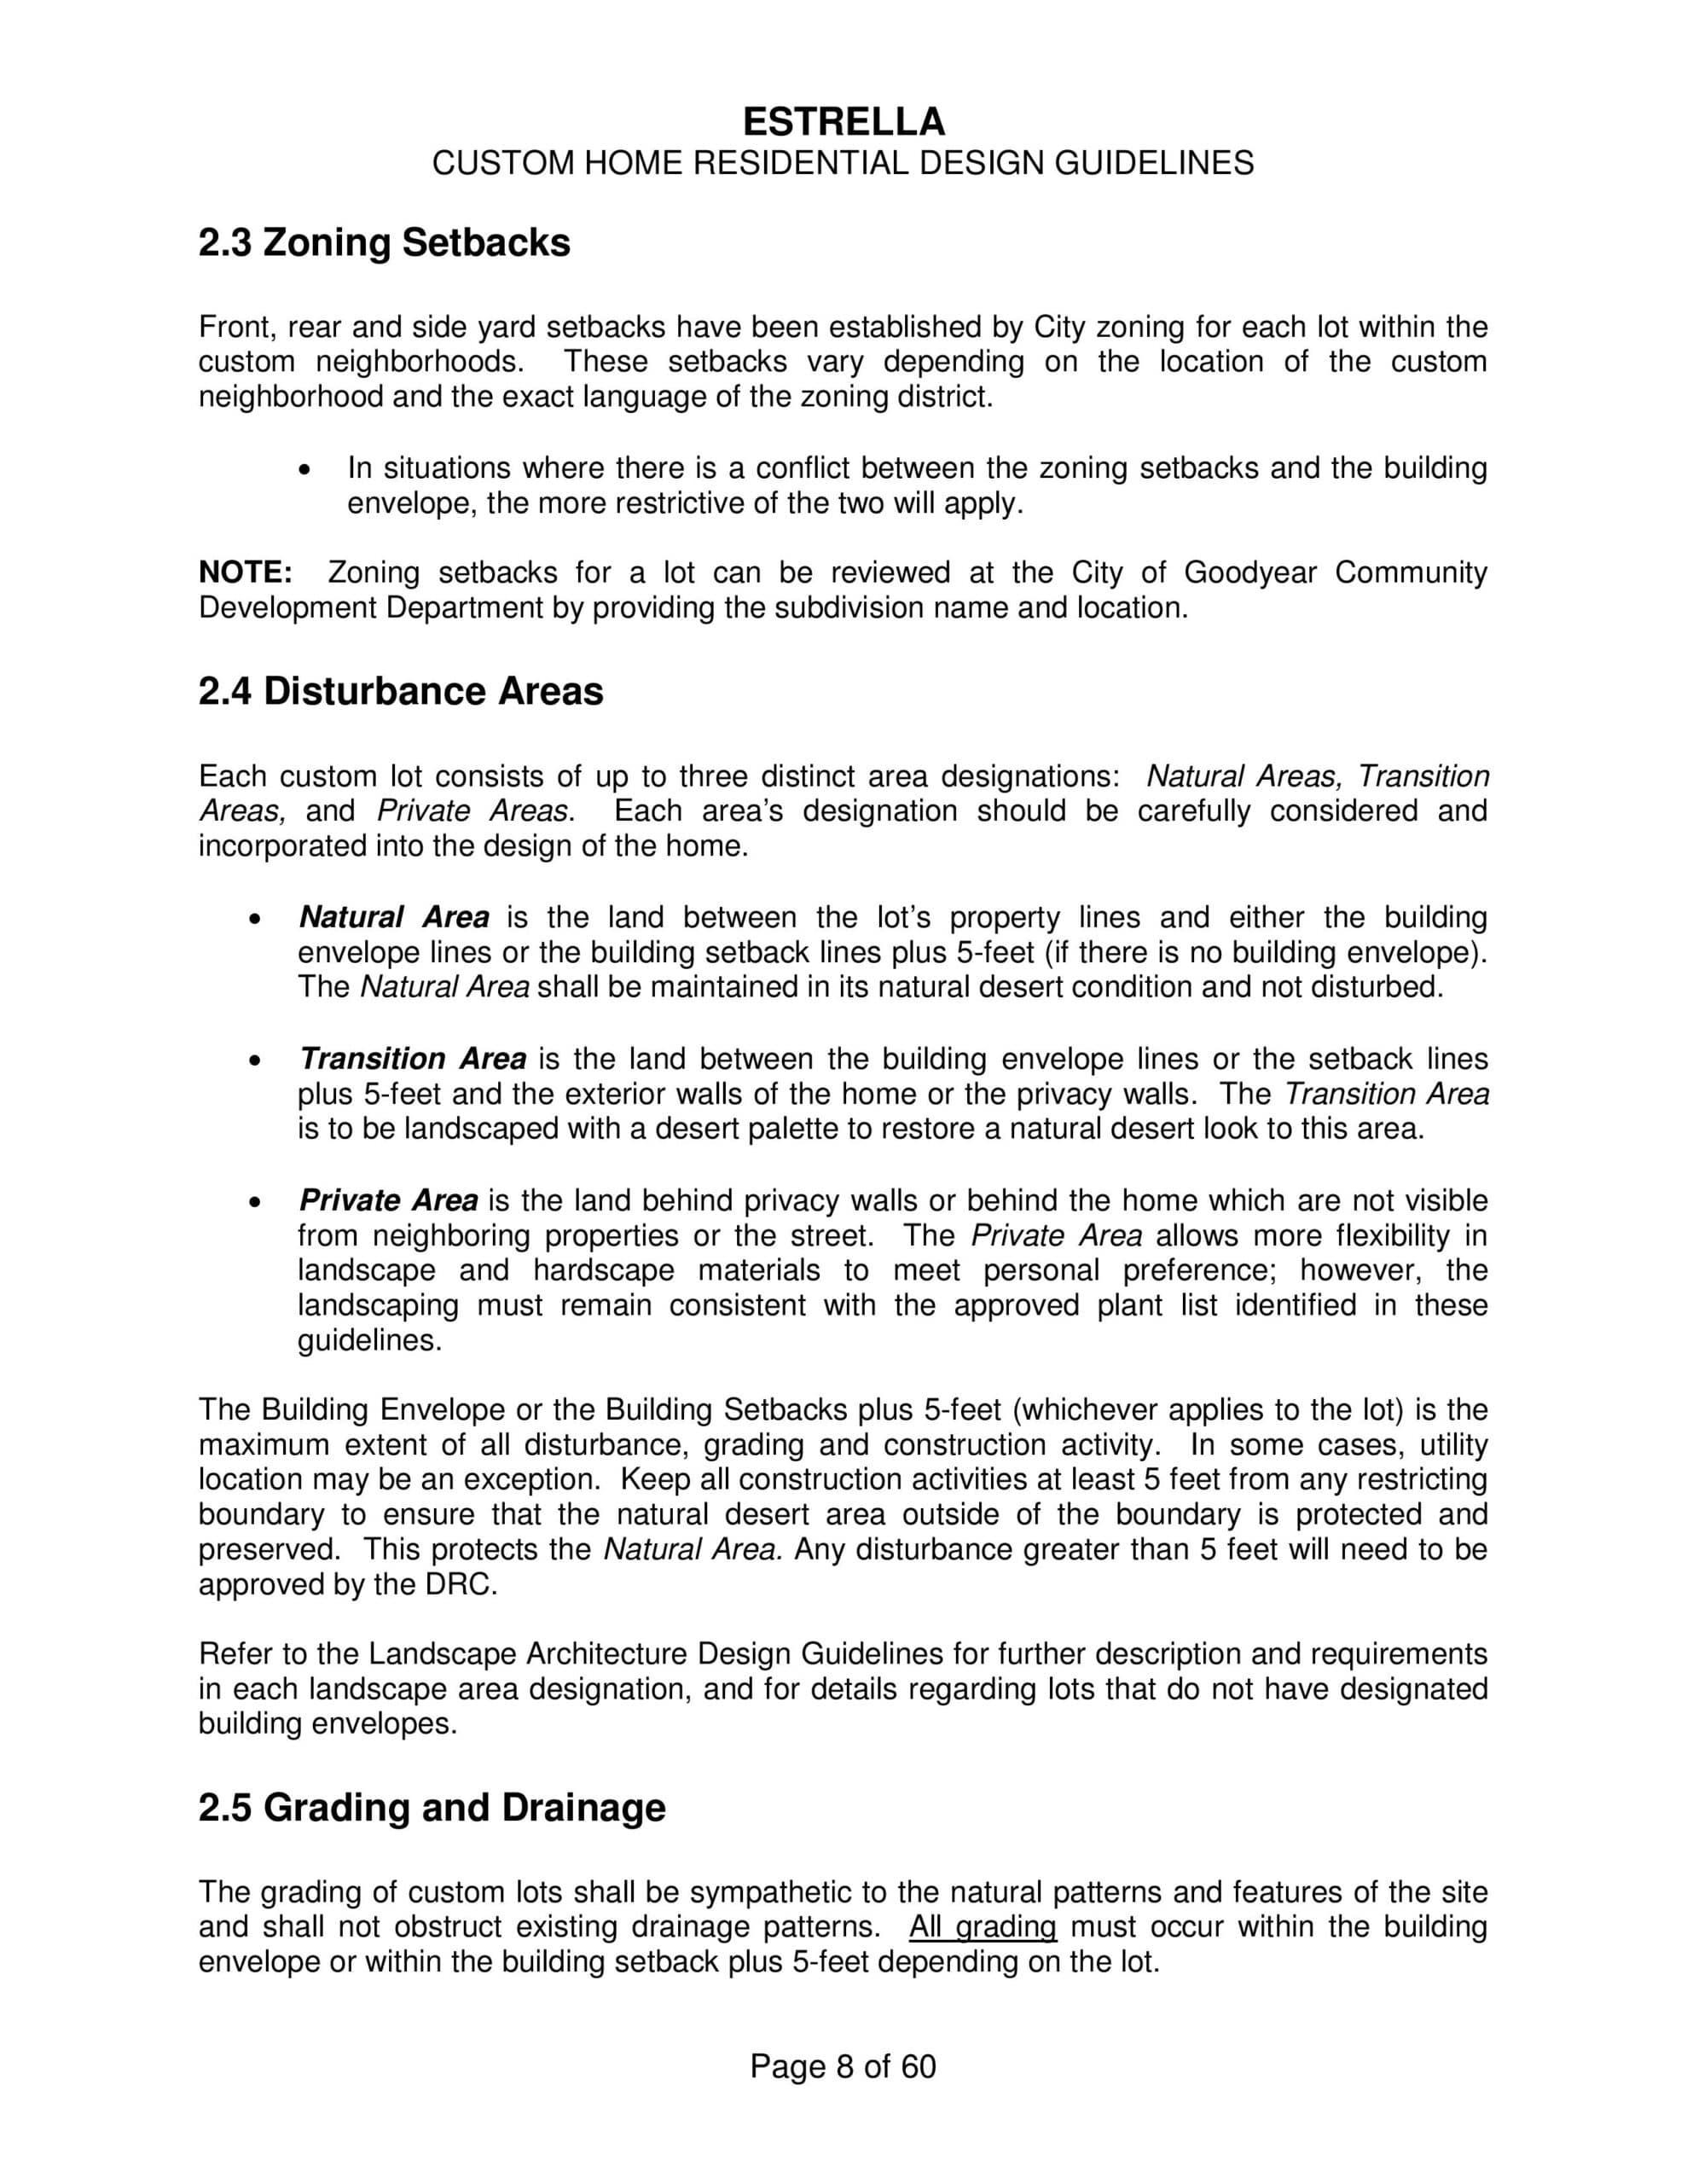 ESTRELLA MOUNTAIN CUSTOM HOME GUIDELINES-page-012